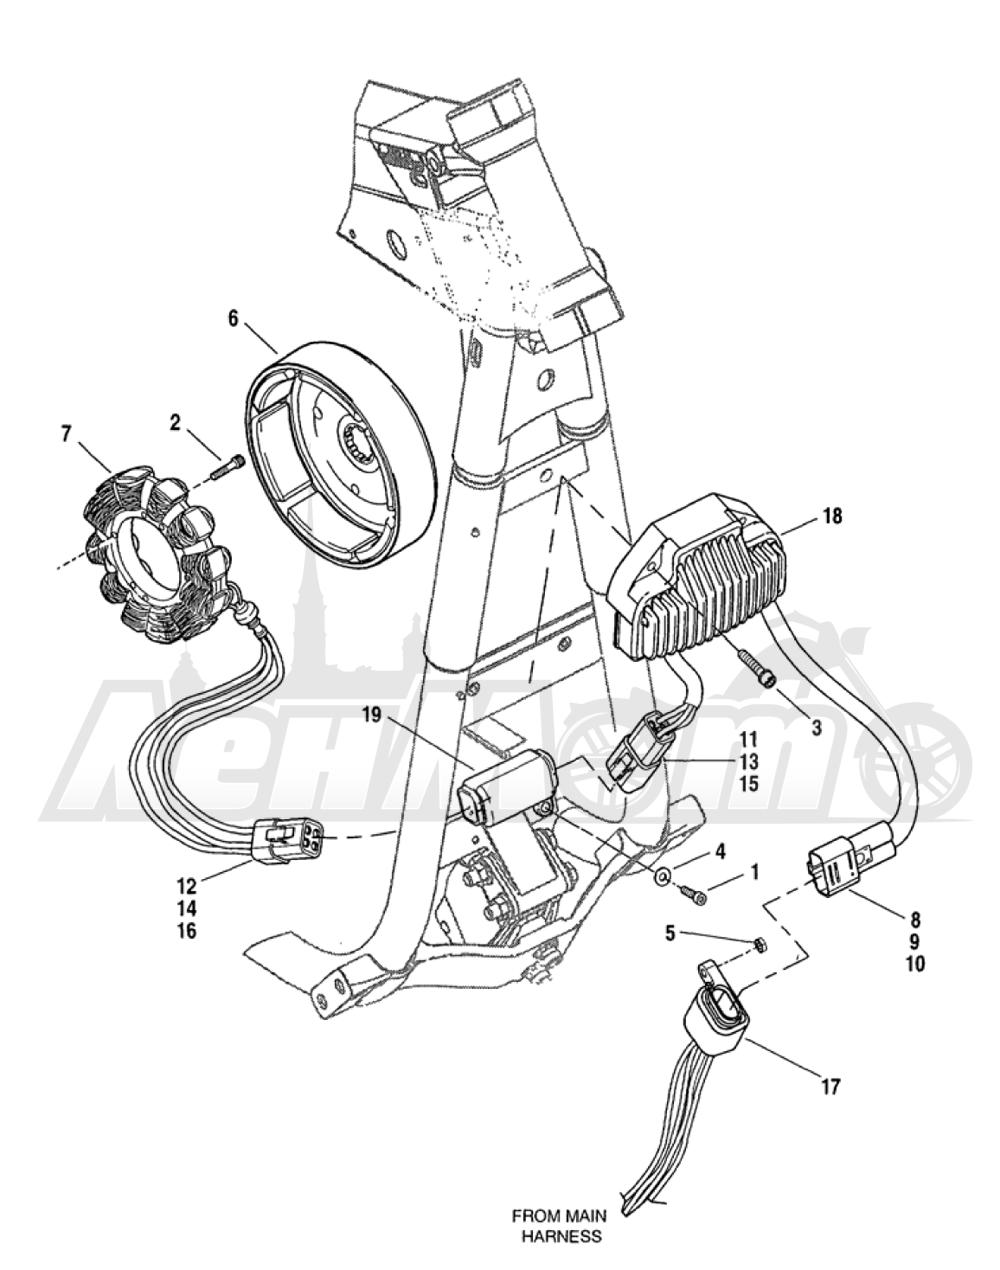 Запчасти для Мотоцикла Harley-Davidson 2005 FXDCI DYNA® SUPER GLIDE CUSTOM (INJECTION) (GV) Раздел: ELECTRICAL - ALTERNATOR W/ VOLTAGE REGULATOR | электрика генератор вместе с регулятор напряжения